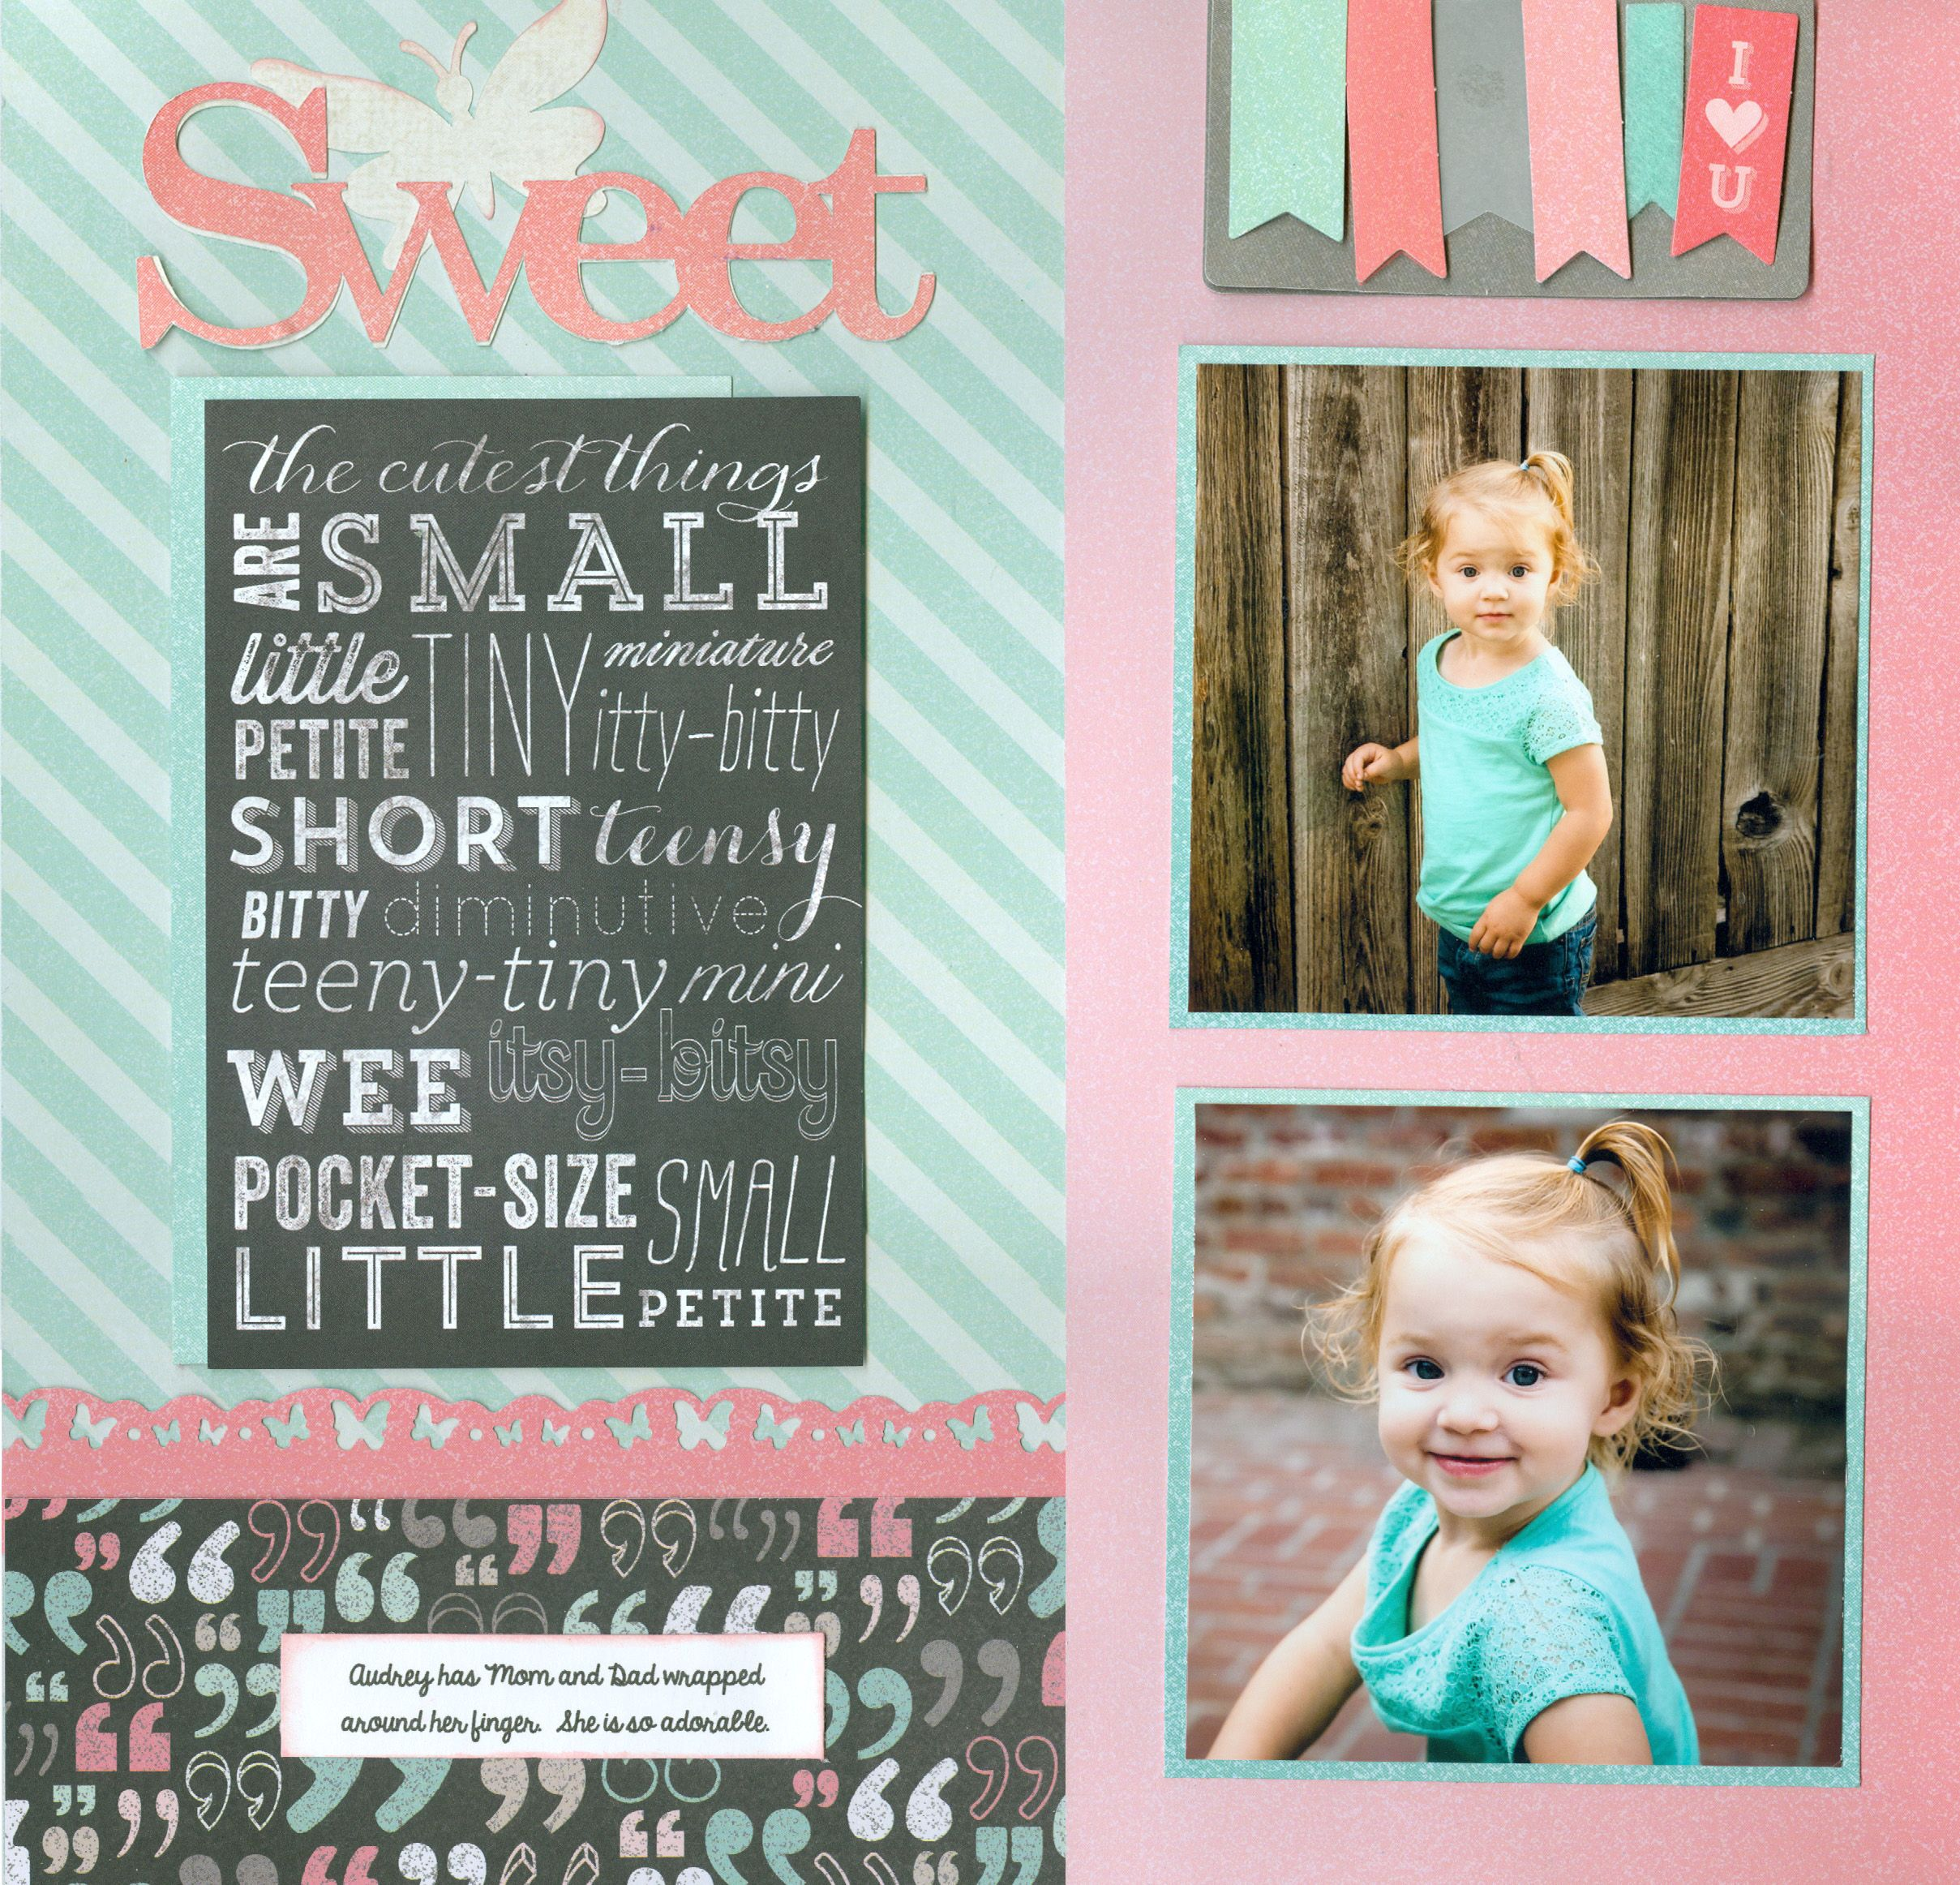 Sweet Audrey pg 2 - Scrapbook.com